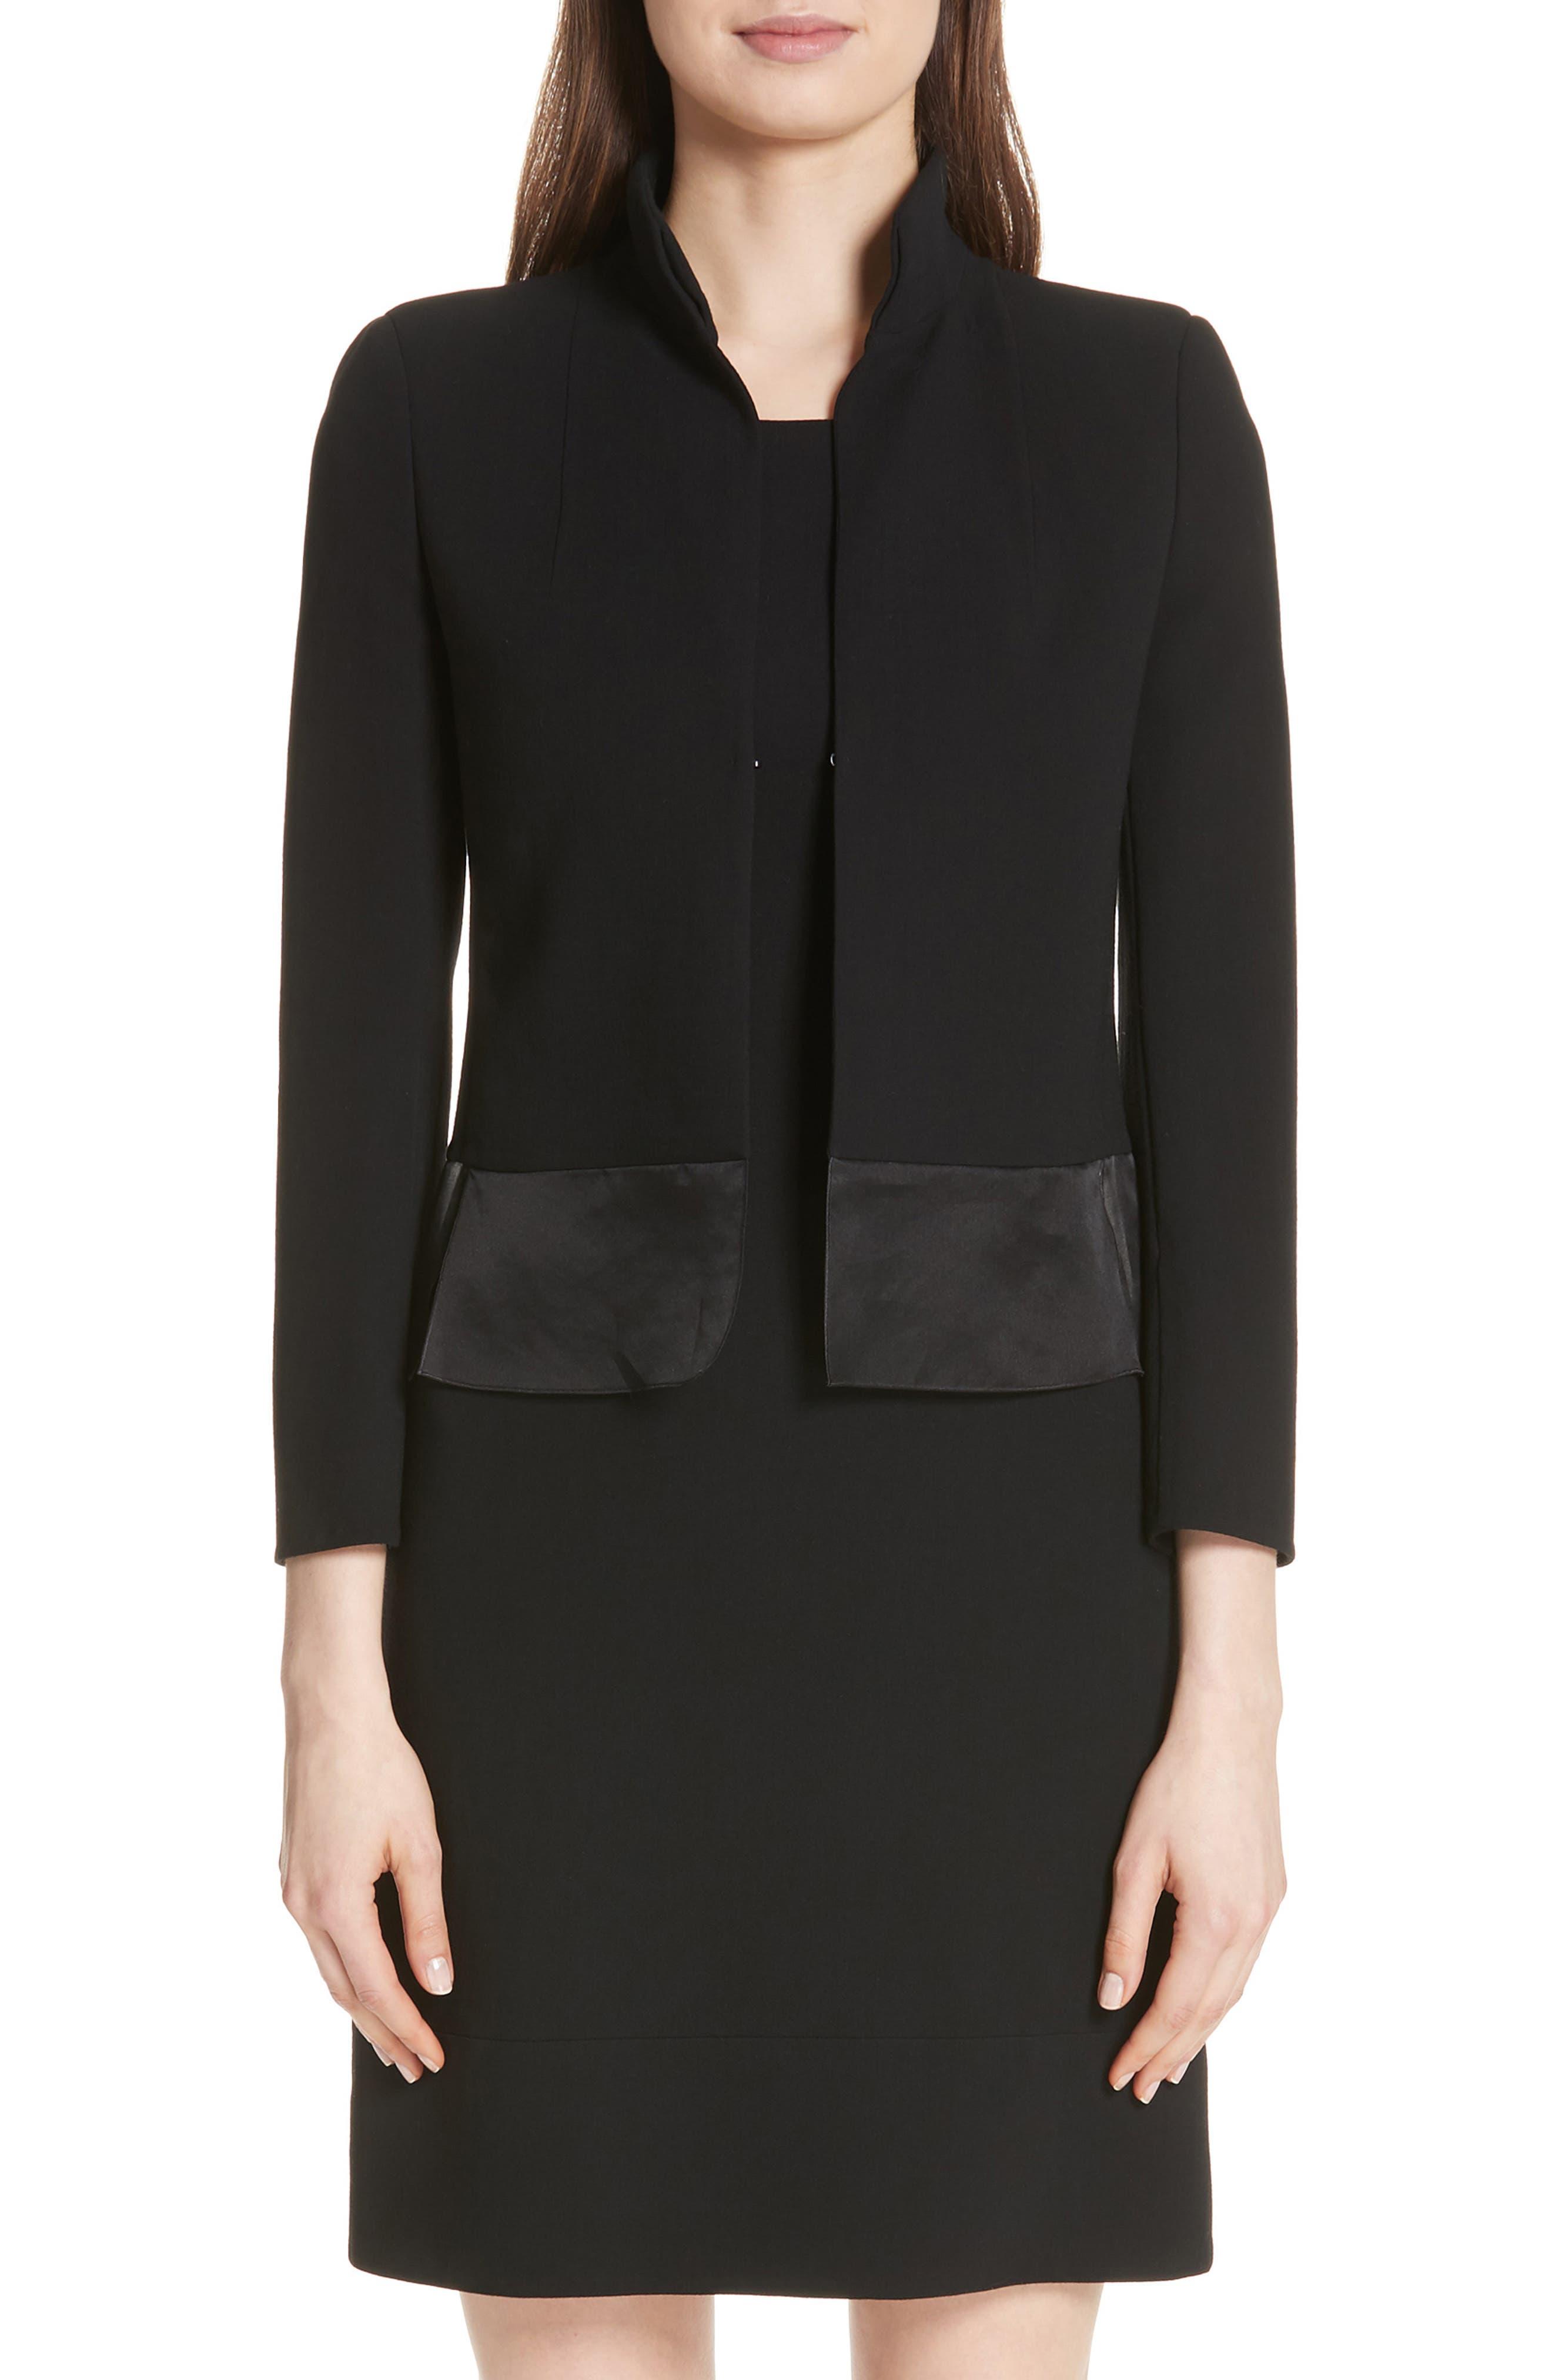 Ilke Double Face Wool Blend Jacket,                             Main thumbnail 1, color,                             BLACK